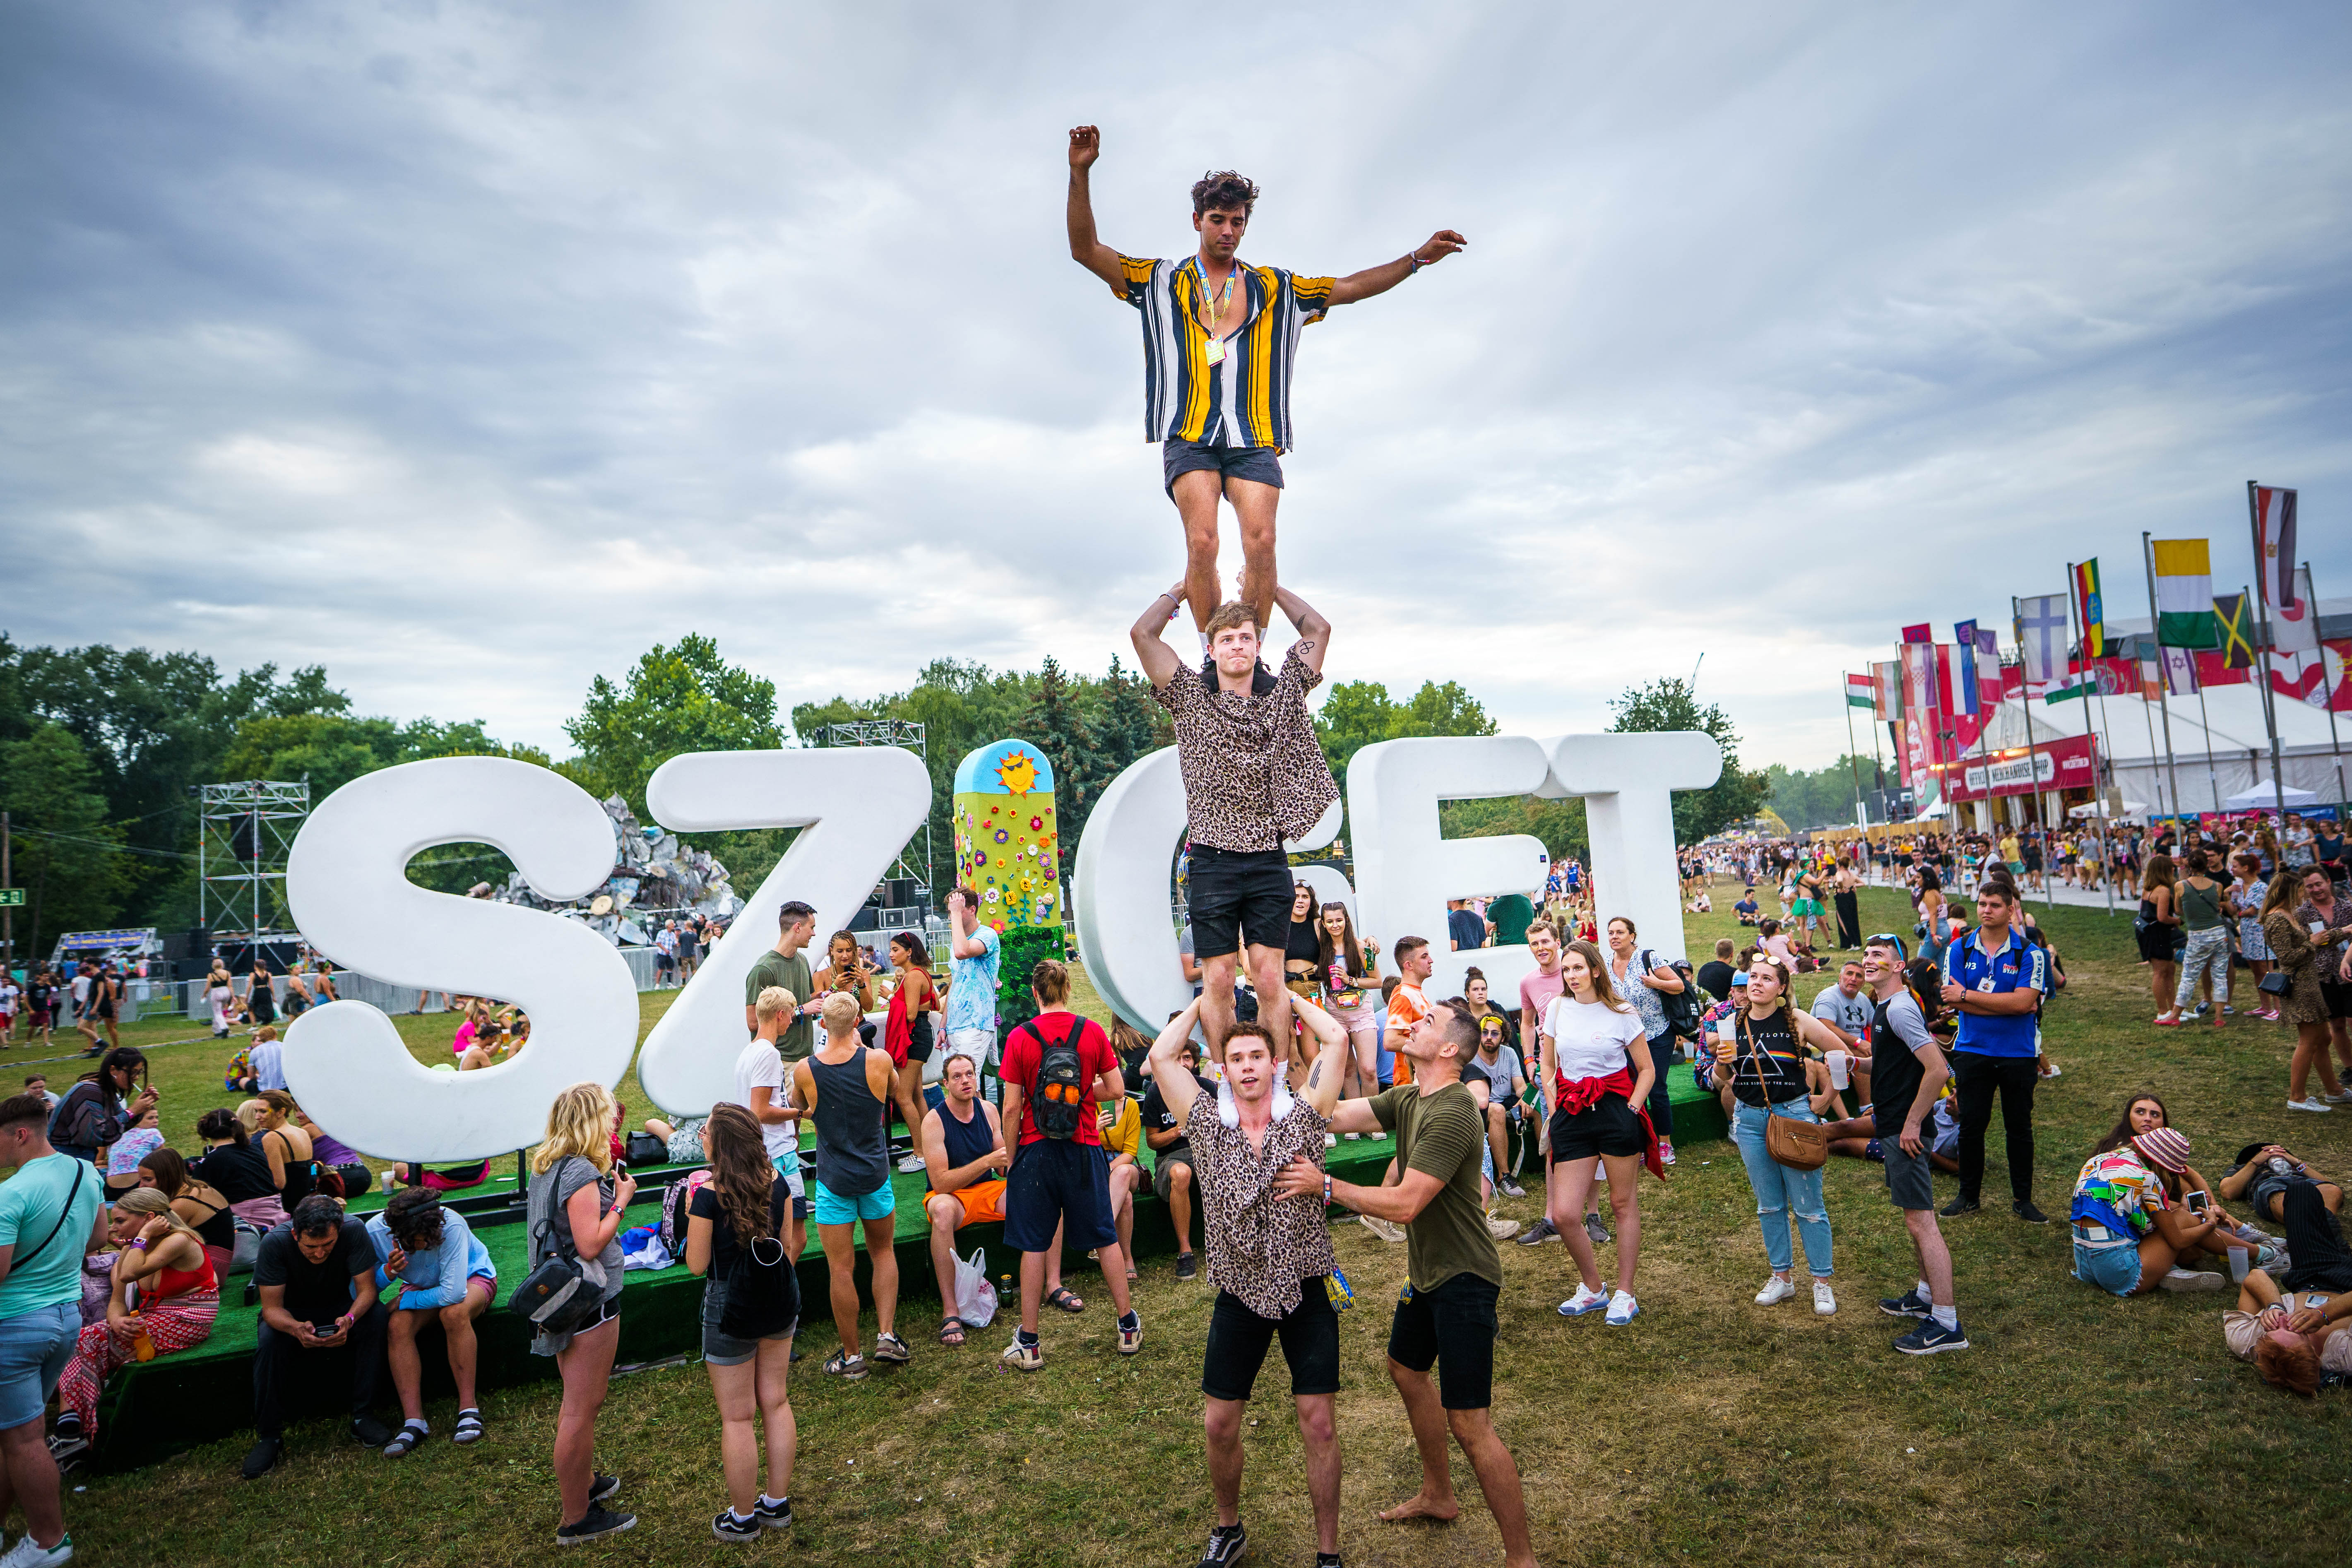 Festival: SZIGET FESTIVAL 2020 - Vorverkauf startet am Donnerstag, 14. November um 12 Uhr